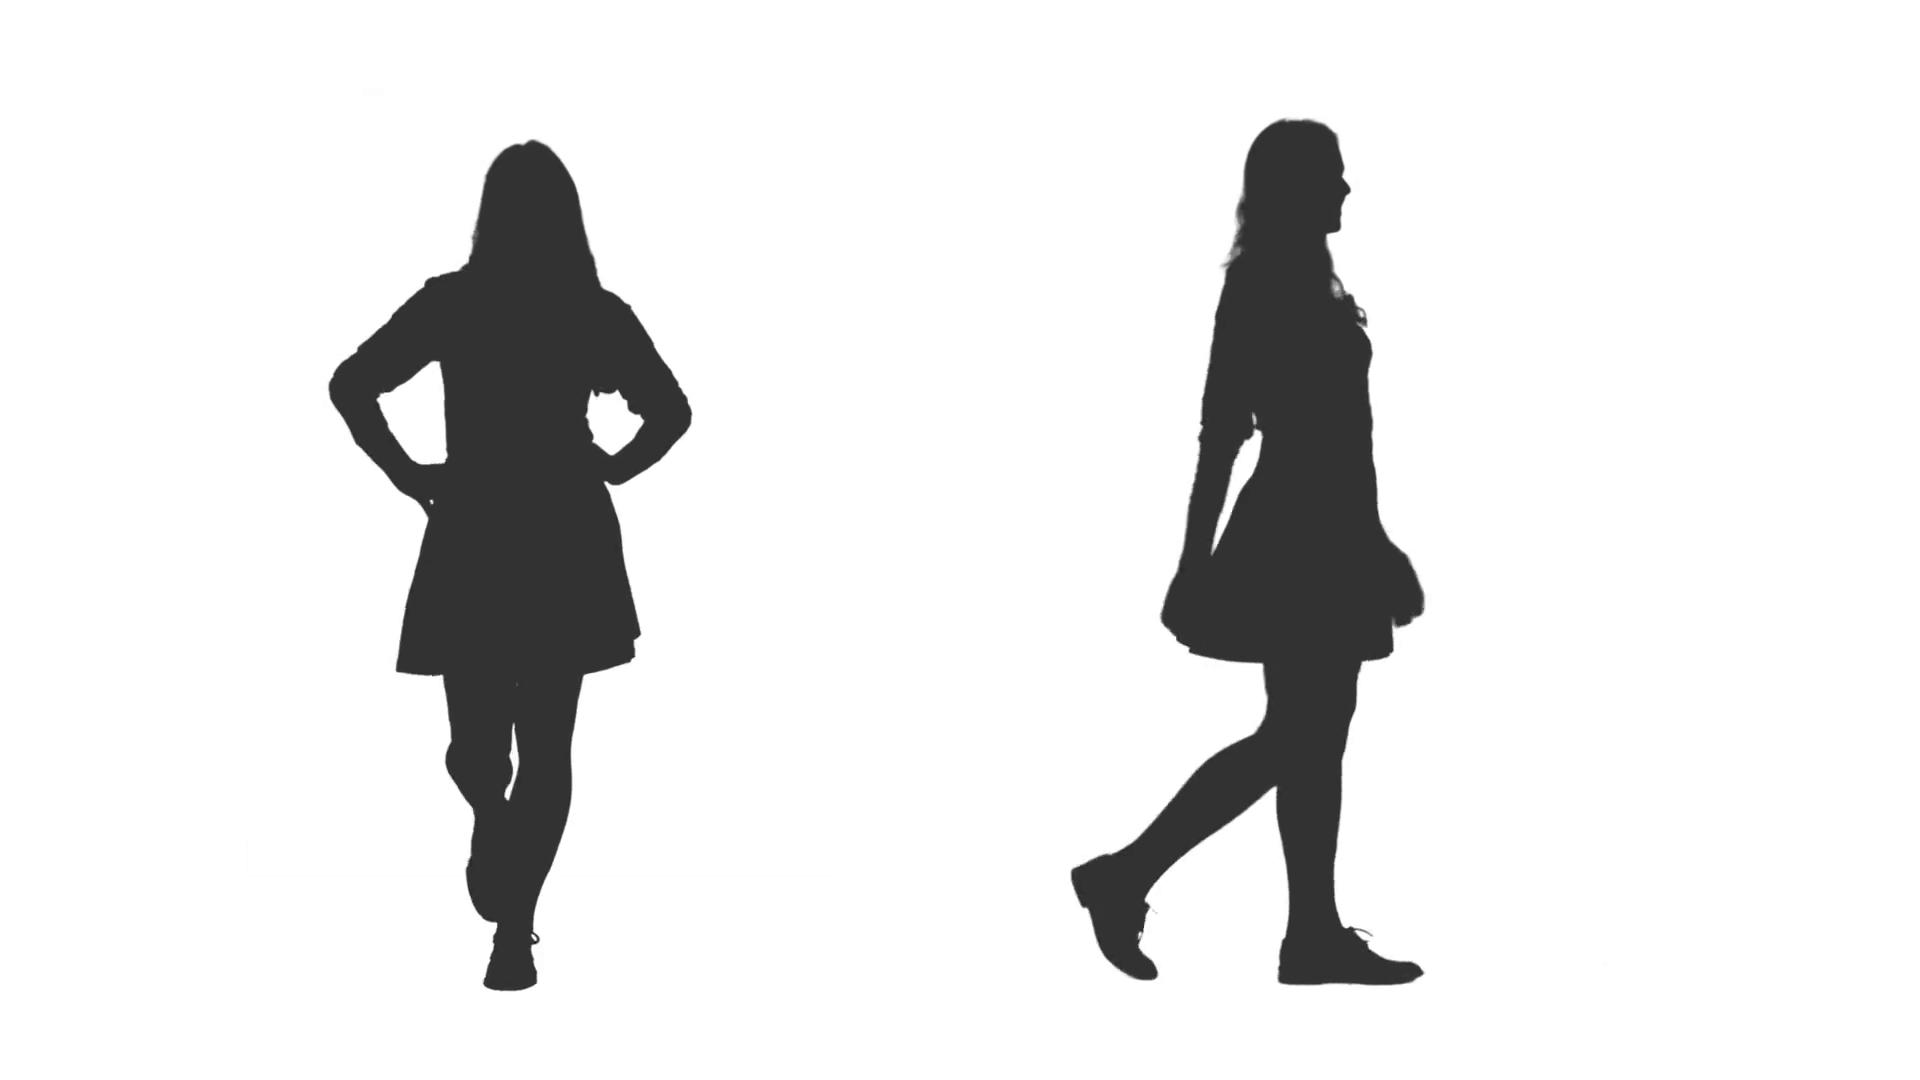 1920x1080 Silhouette Cheerful Young Woman Walking In Mini Skirt, 2 In 1